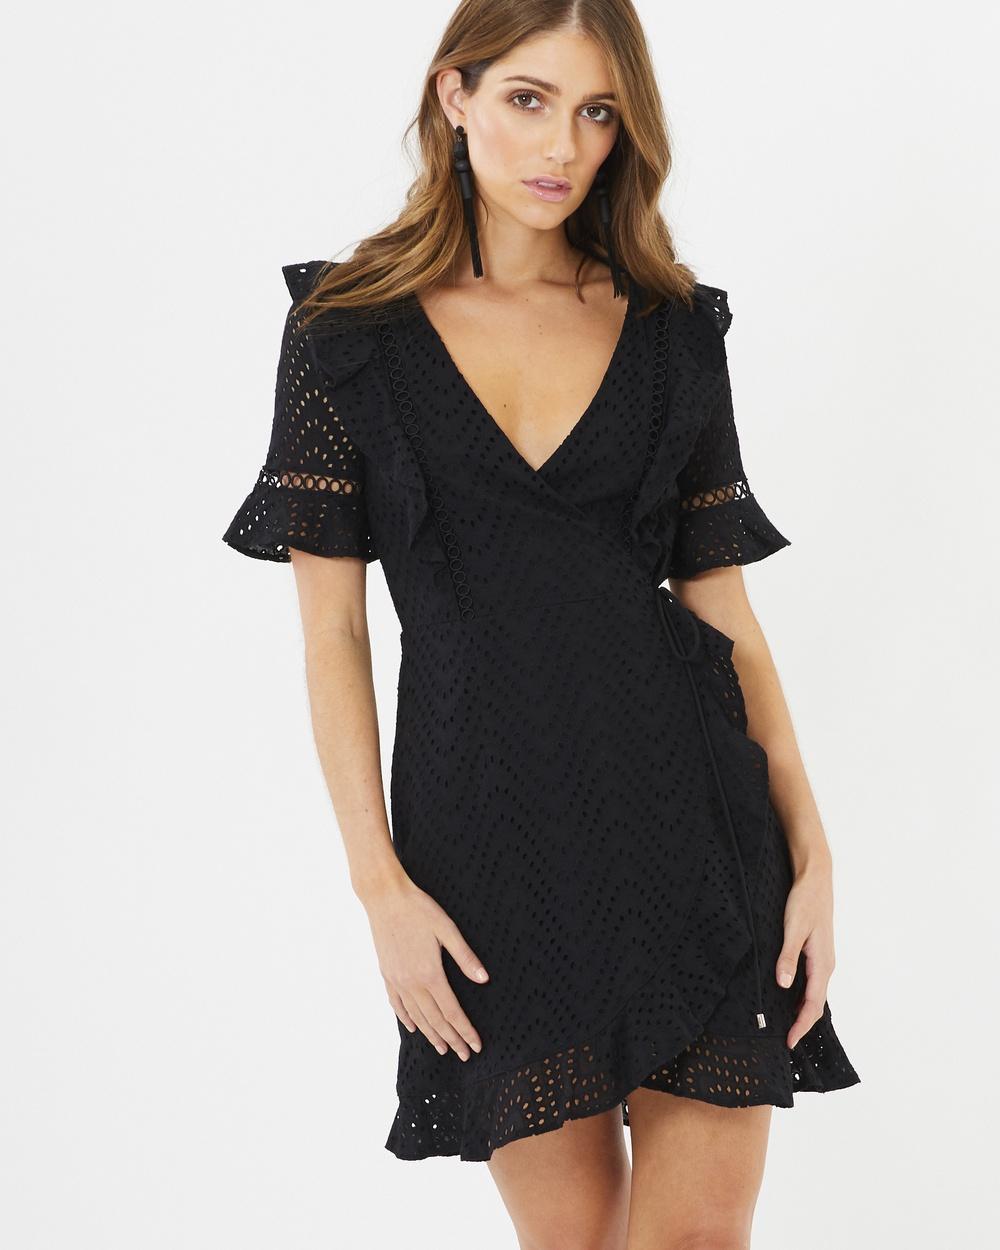 CHANCERY Megan Lace Wrap Dress Dresses Black Lace Megan Lace Wrap Dress